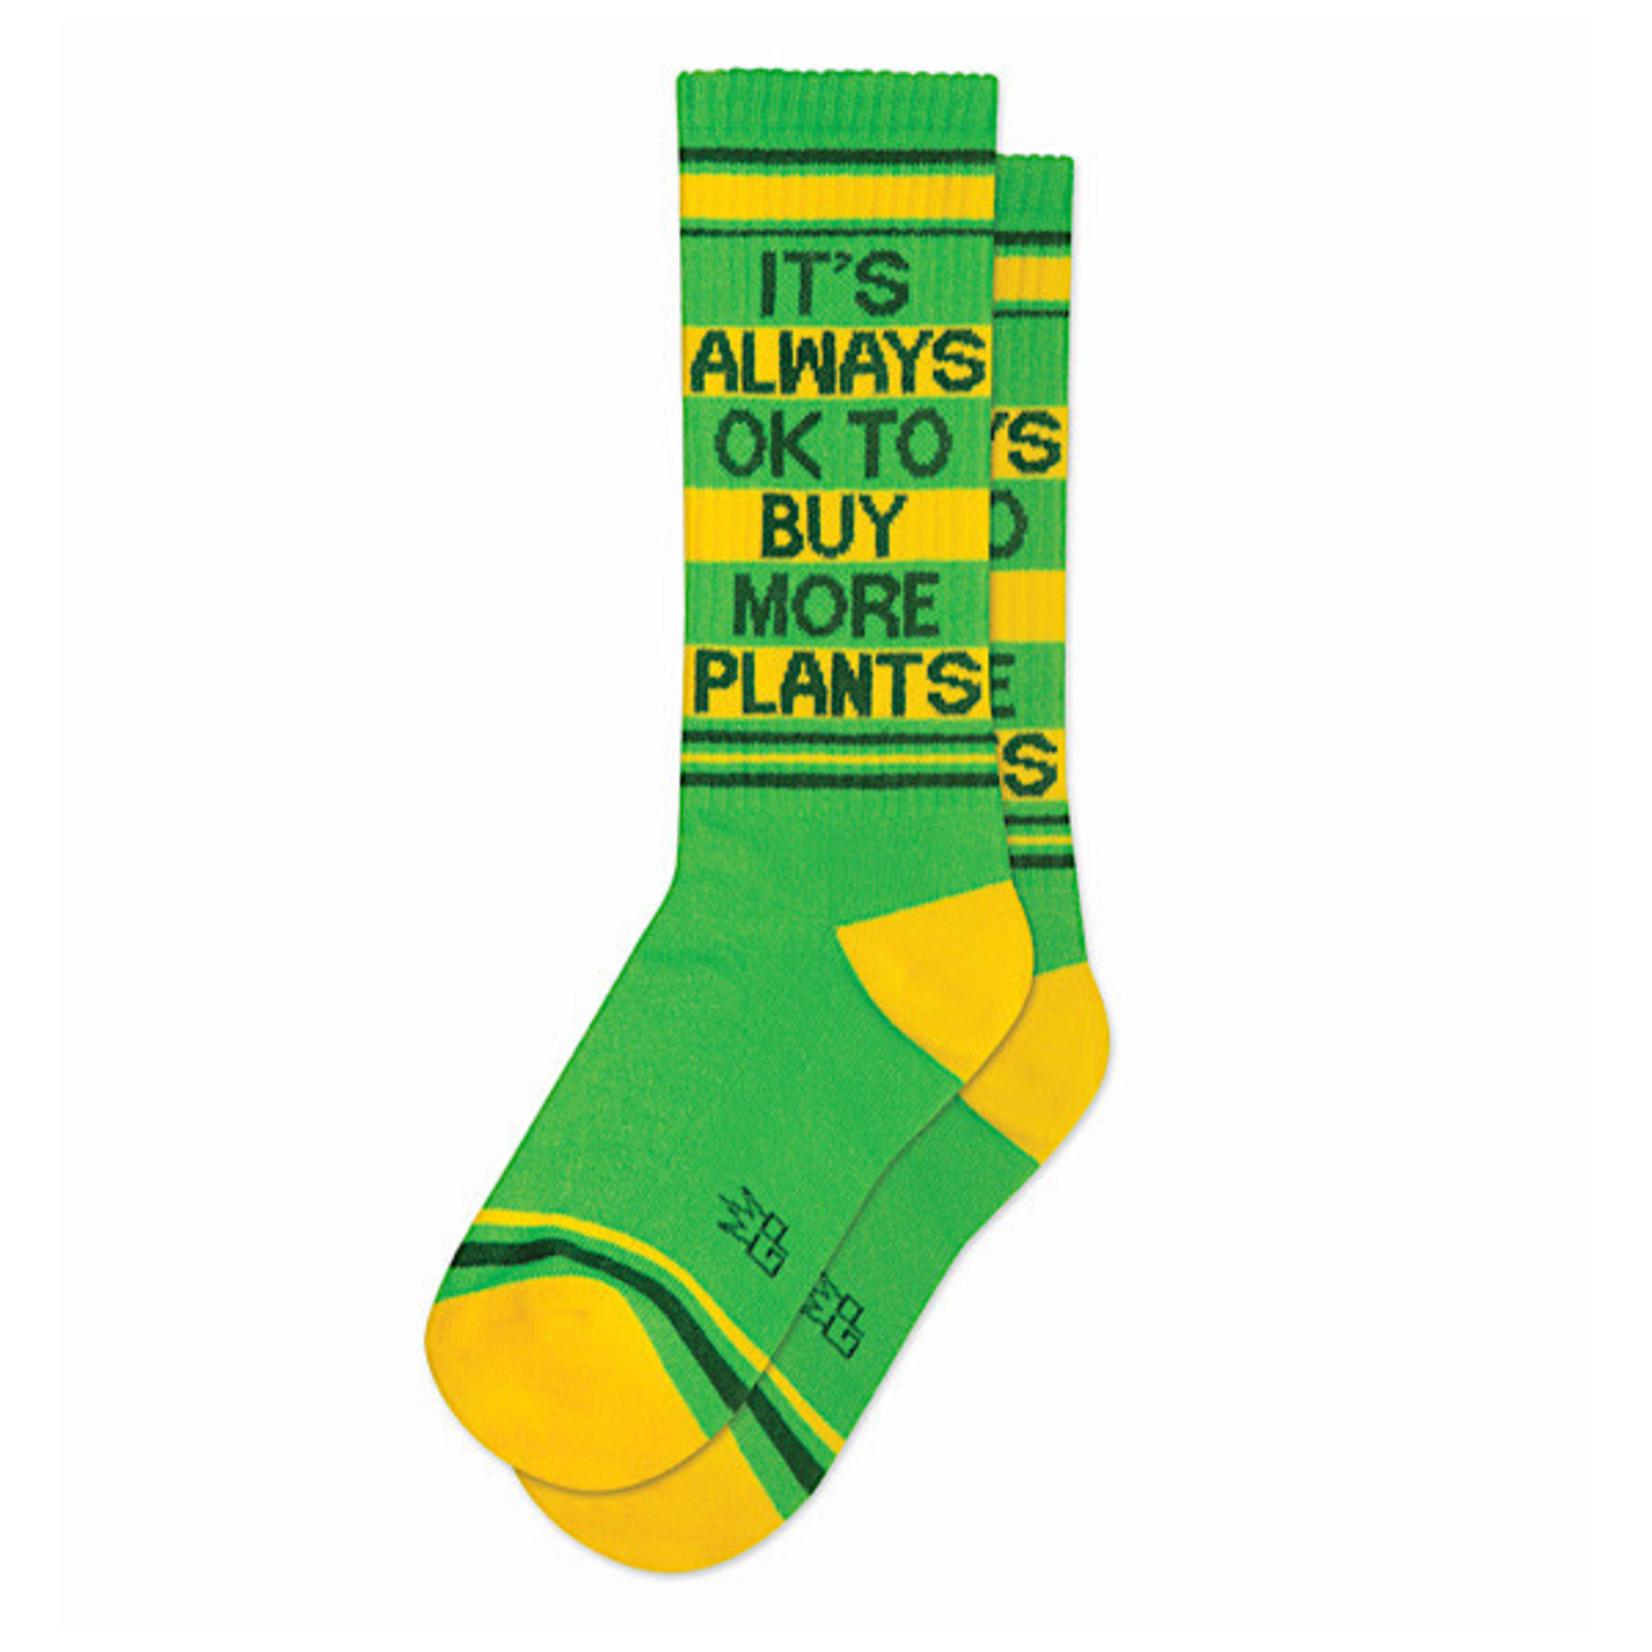 Socks (Unisex) - It's Always Ok To Buy More Plants